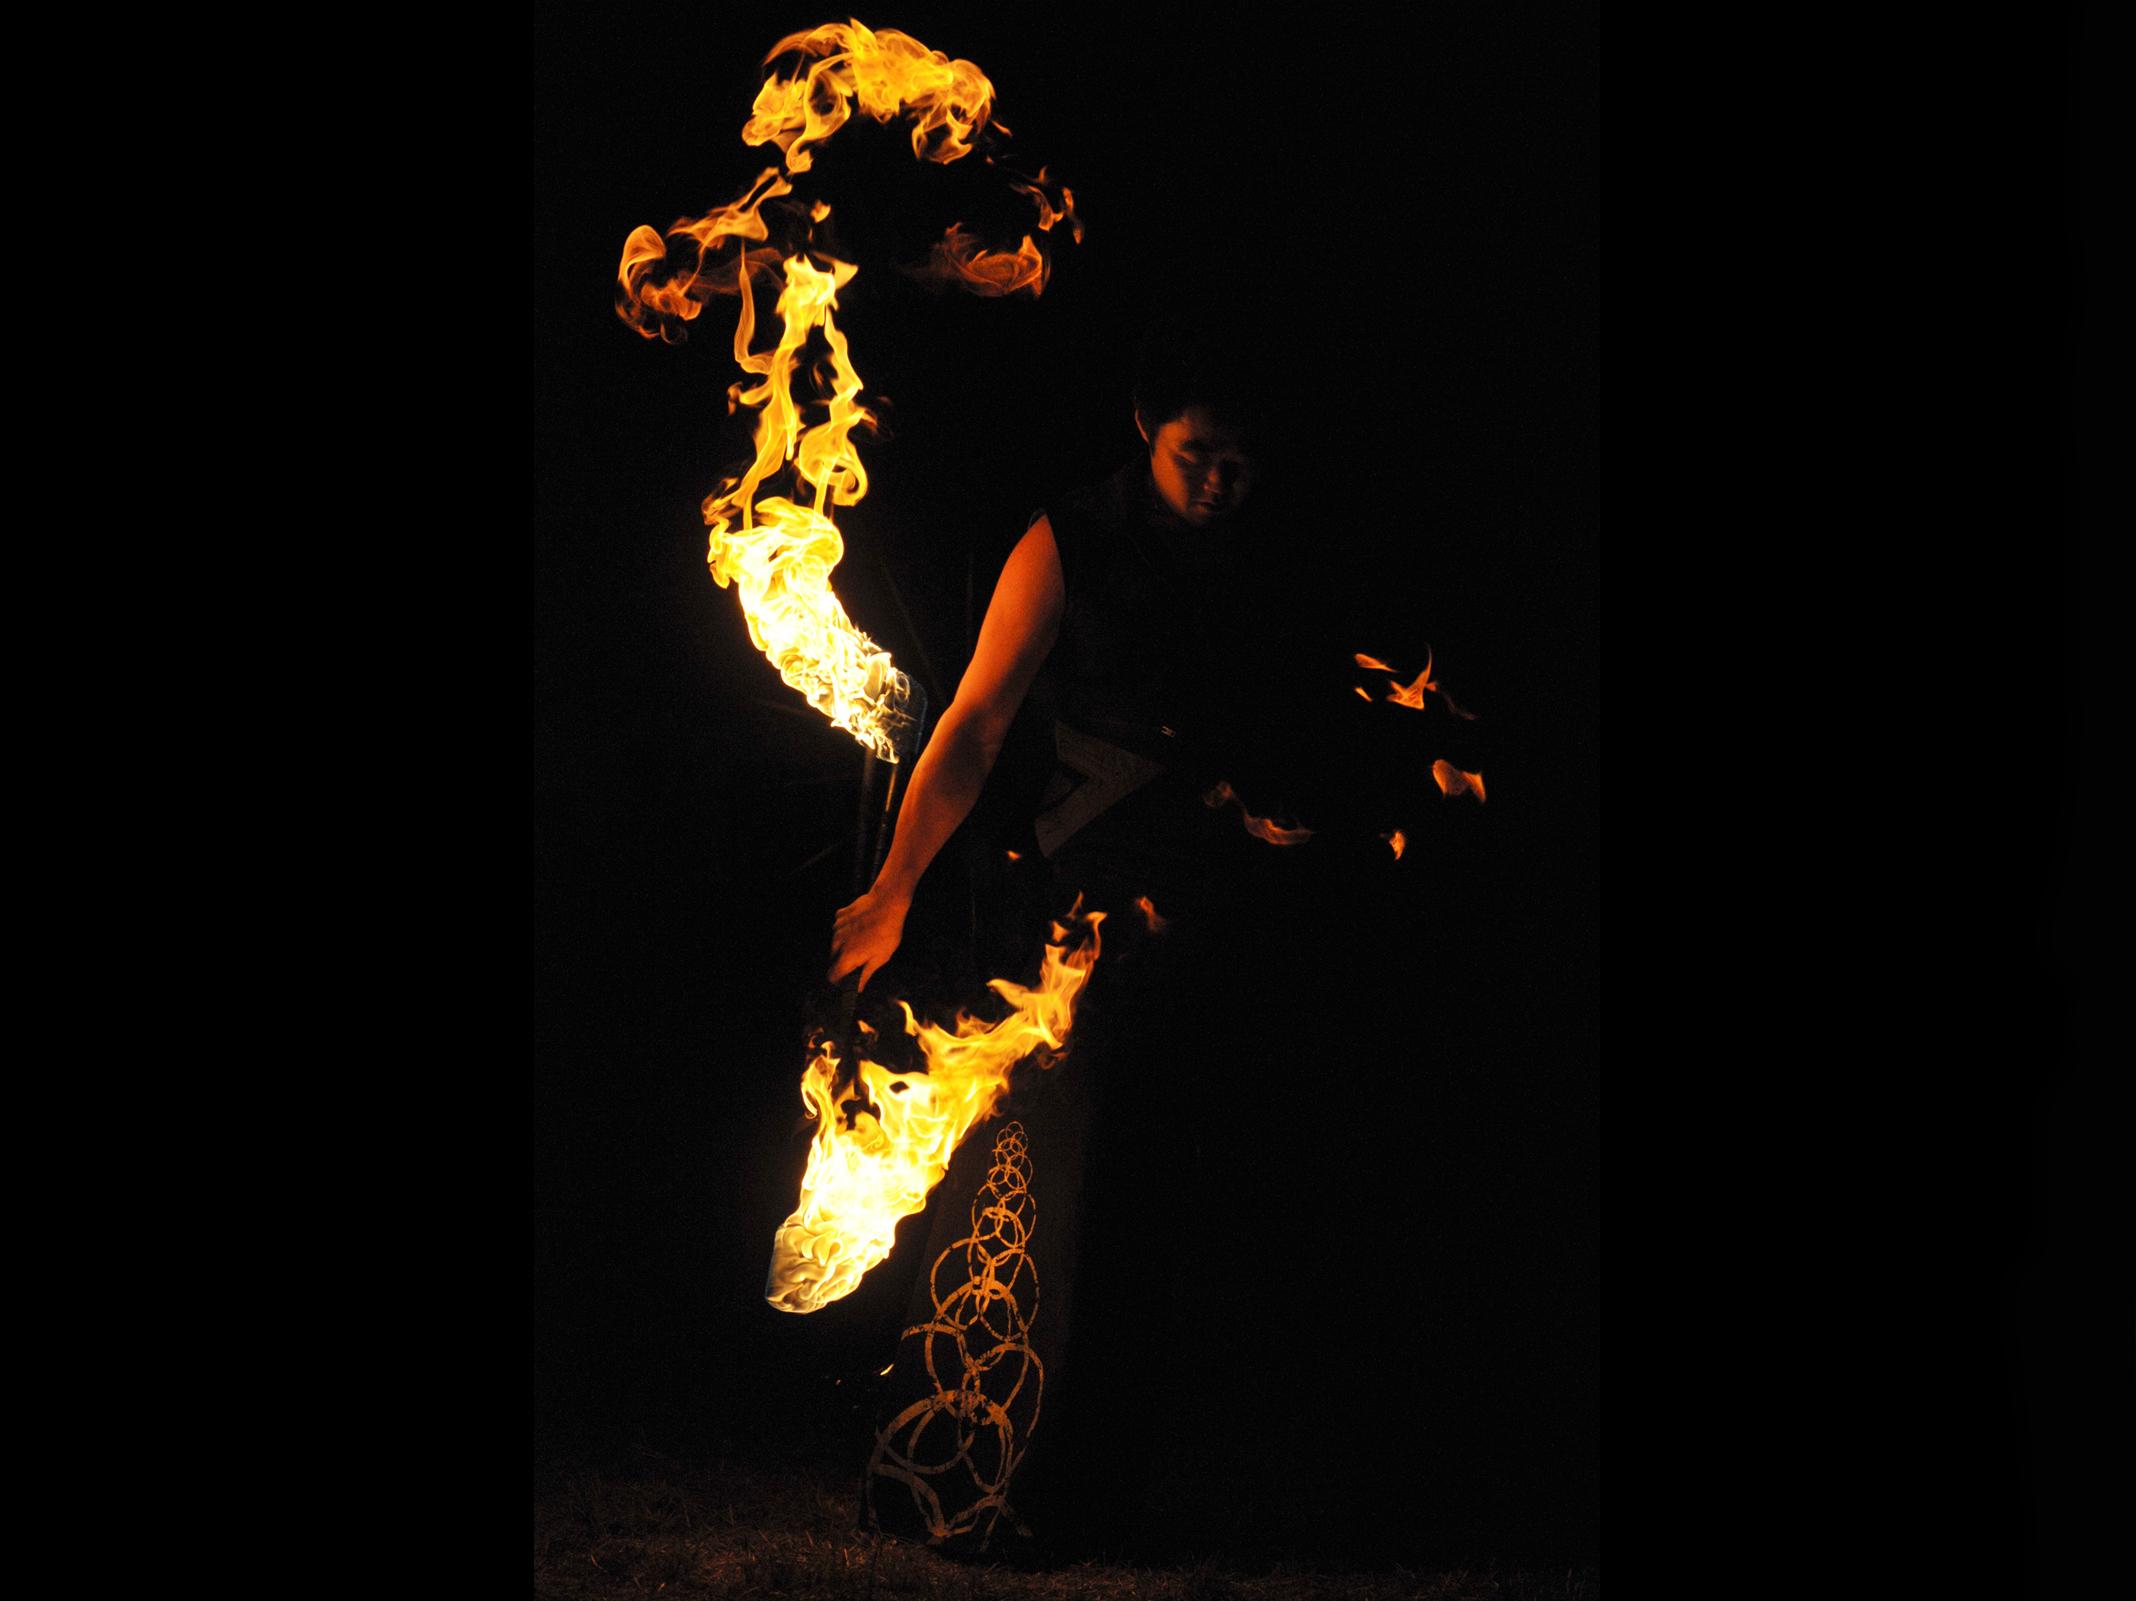 Fire Arts_Flaming Fire team_leeroy (4)